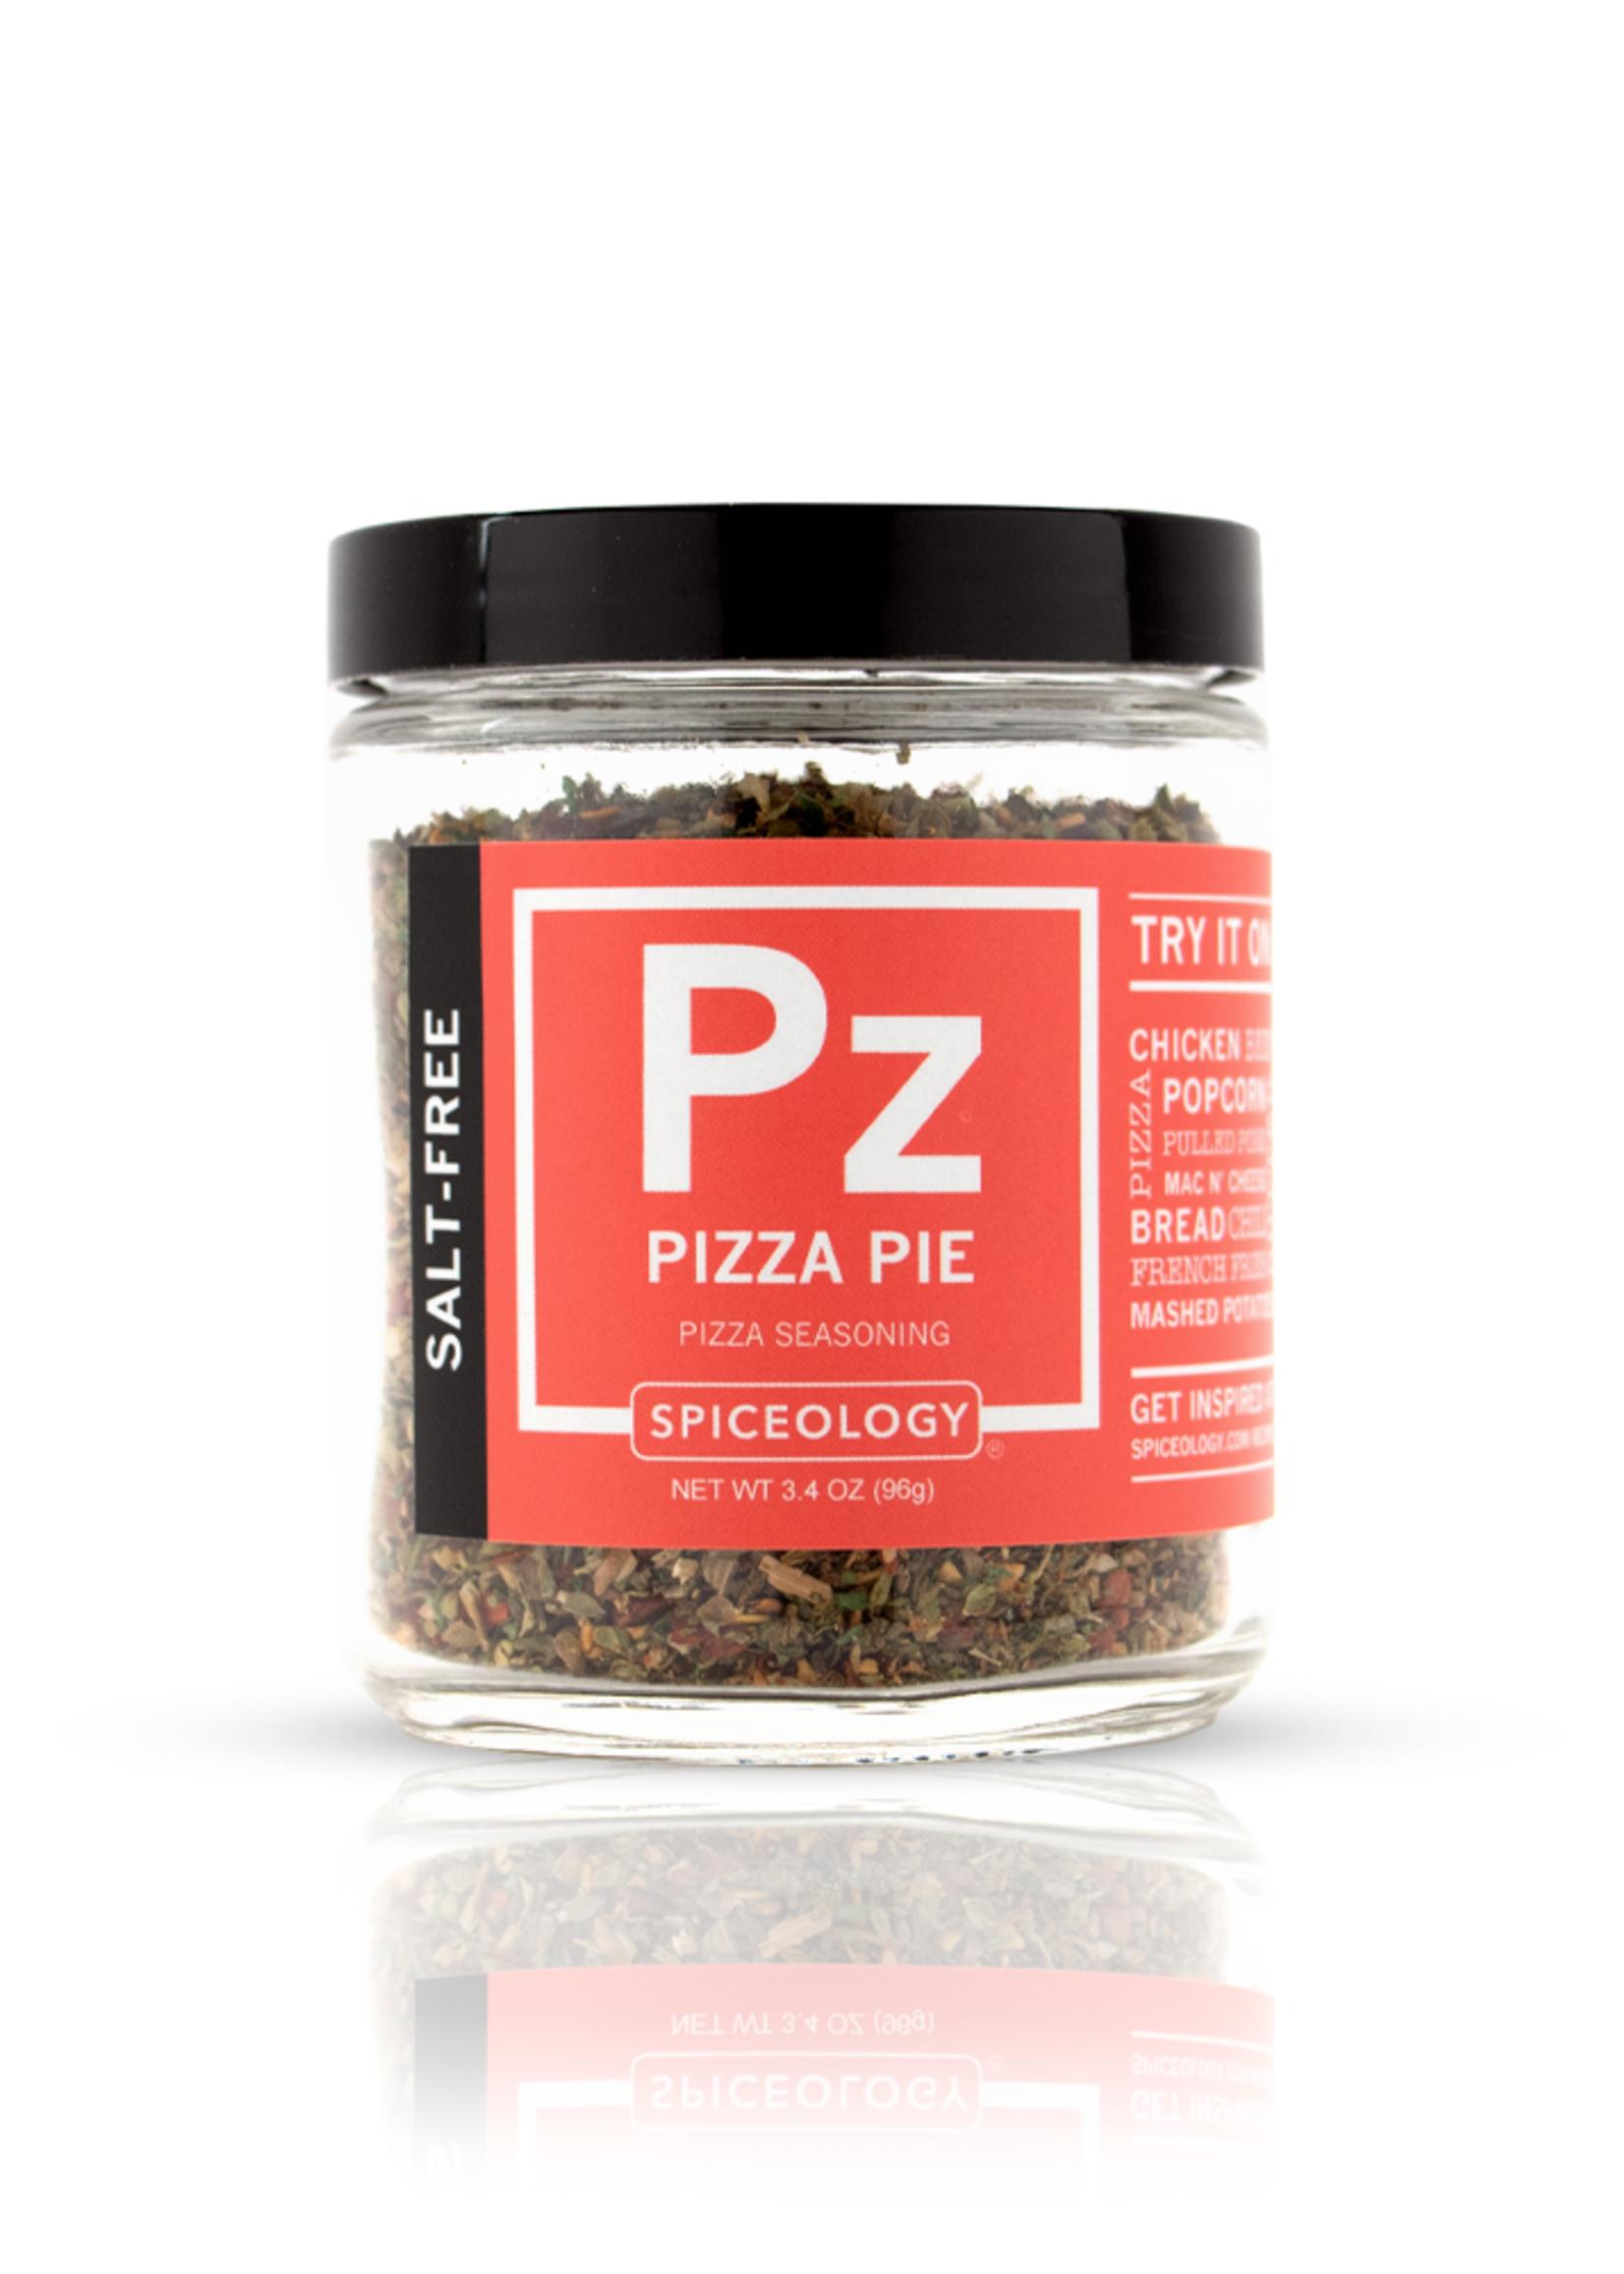 Spiceology Pizza Pie Seasoning